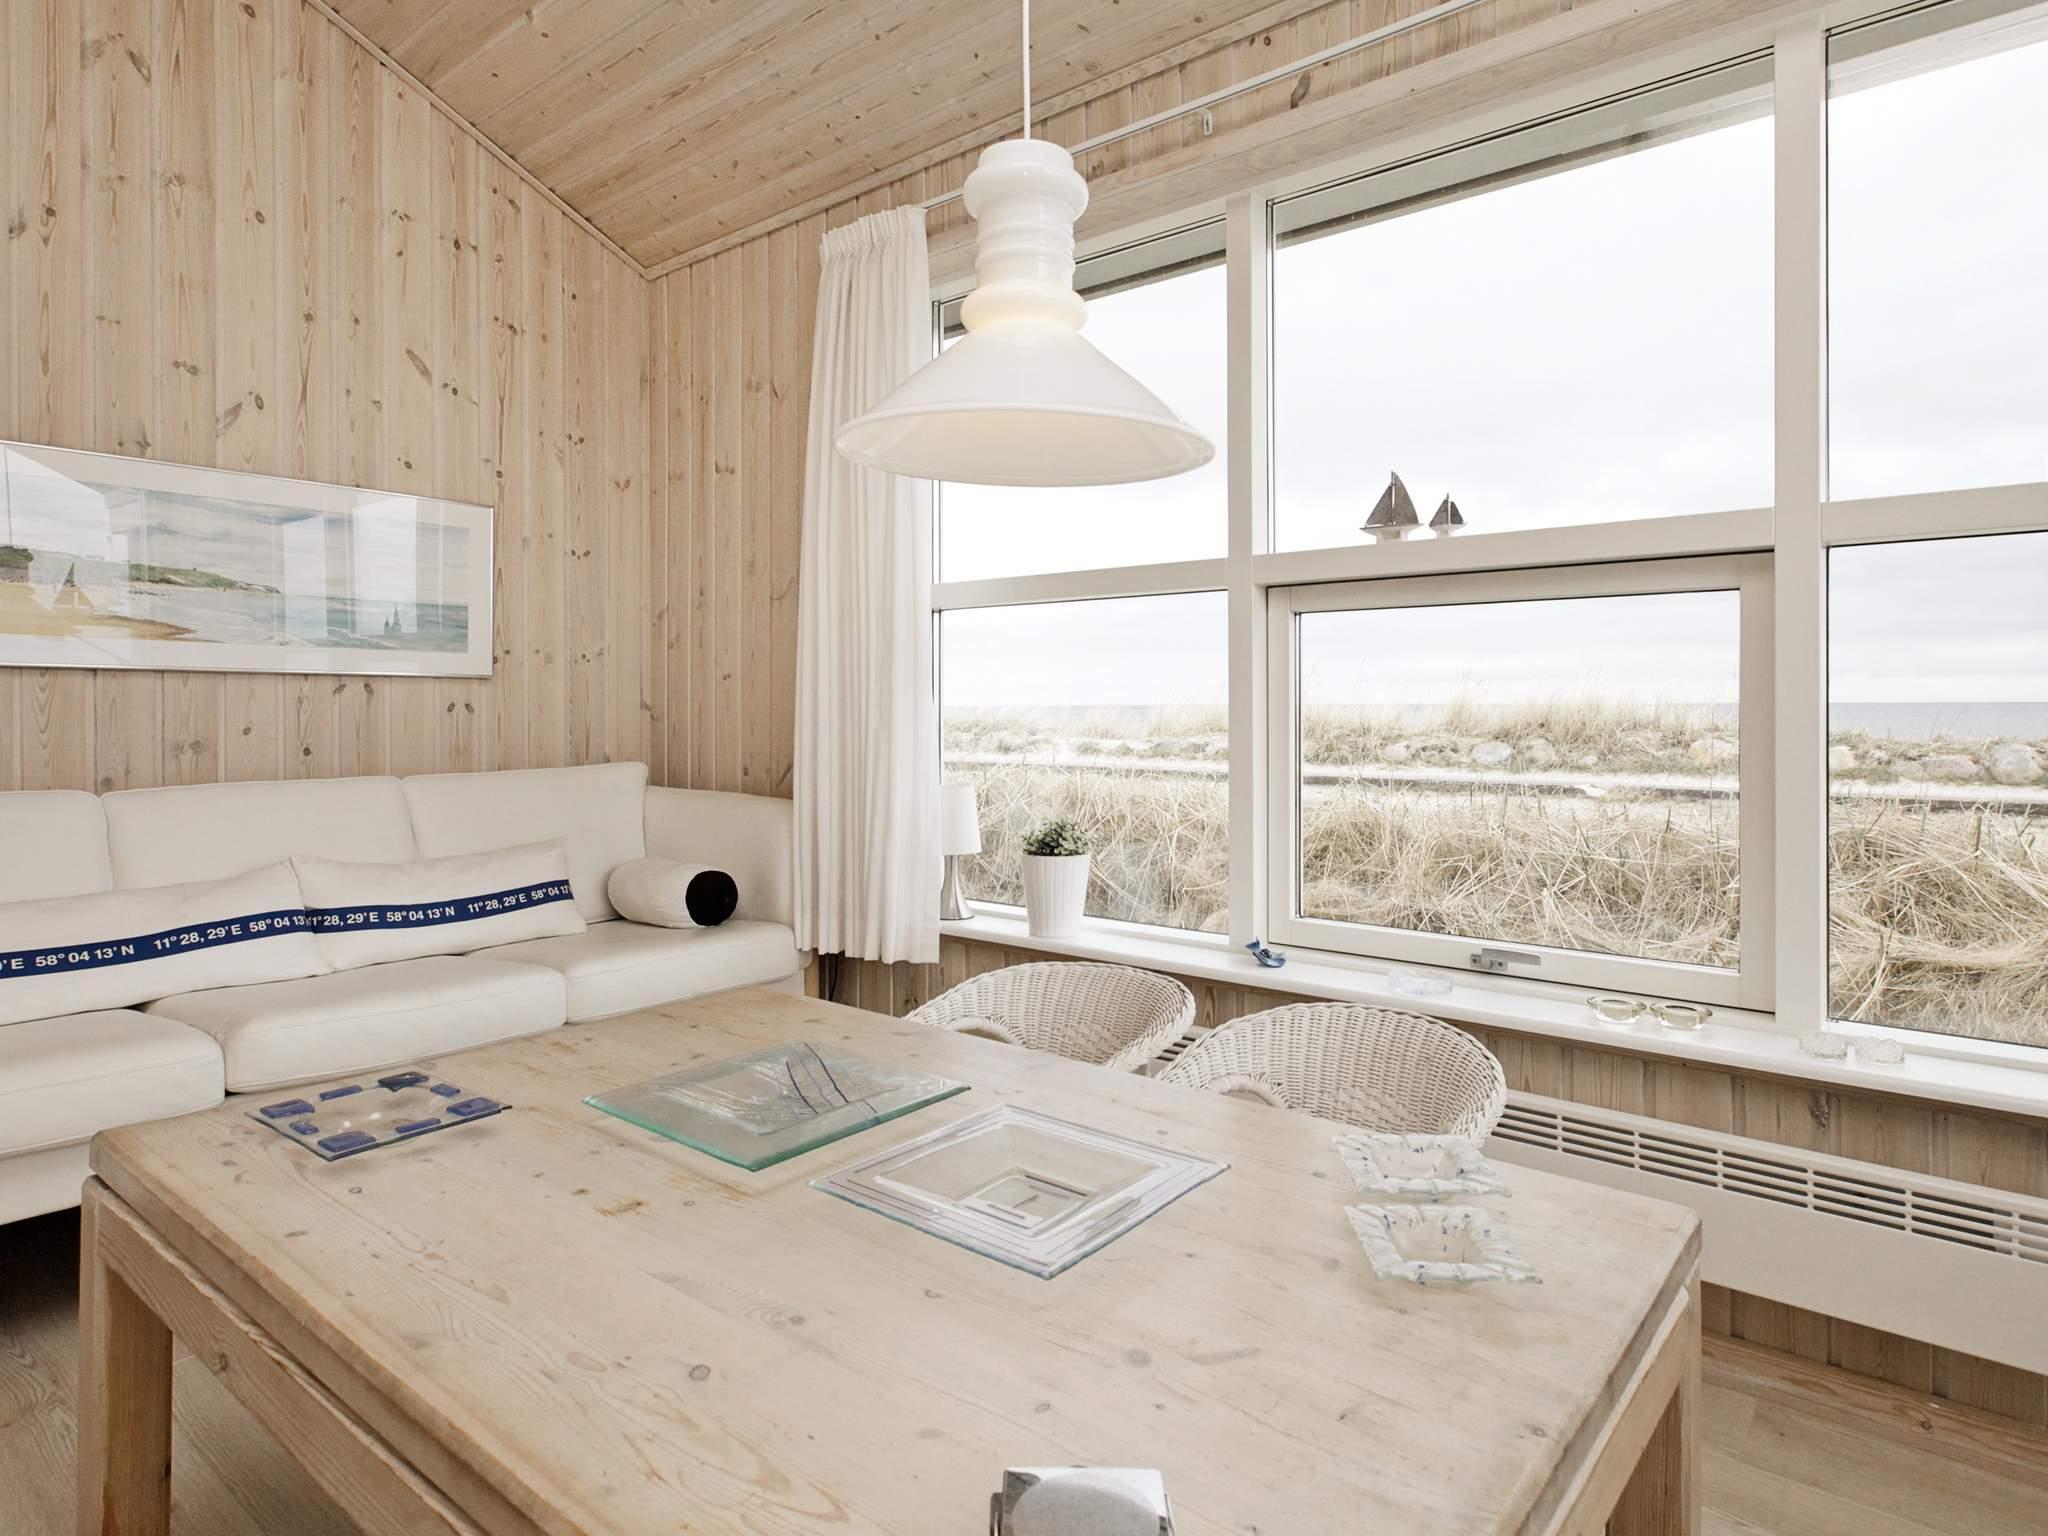 Ferienhaus Sæby/Sulbæk (83969), Sæby, , Nordostjütland, Dänemark, Bild 10